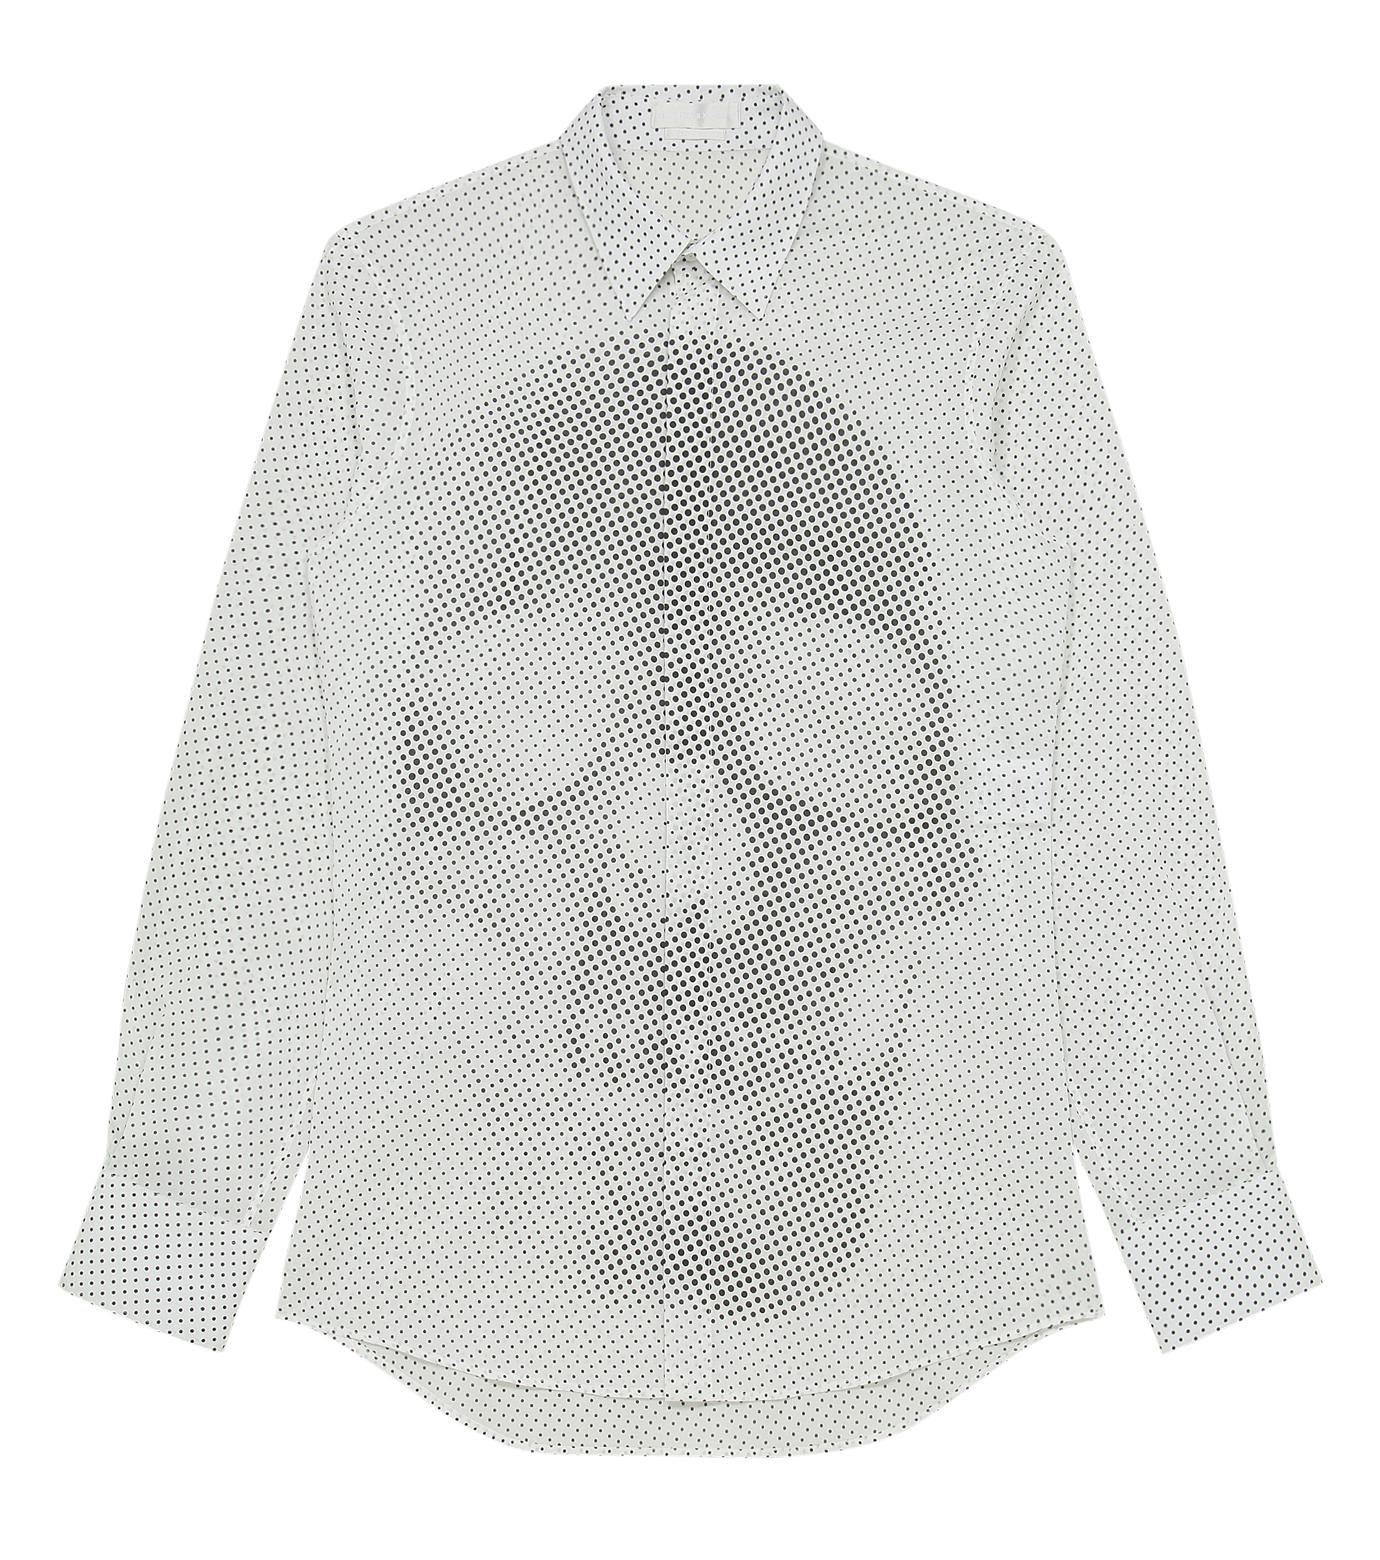 Alexander McQueen(アレキサンダーマックイーン)のSkul dots shirt-WHITE-283024-QW601-4 拡大詳細画像1